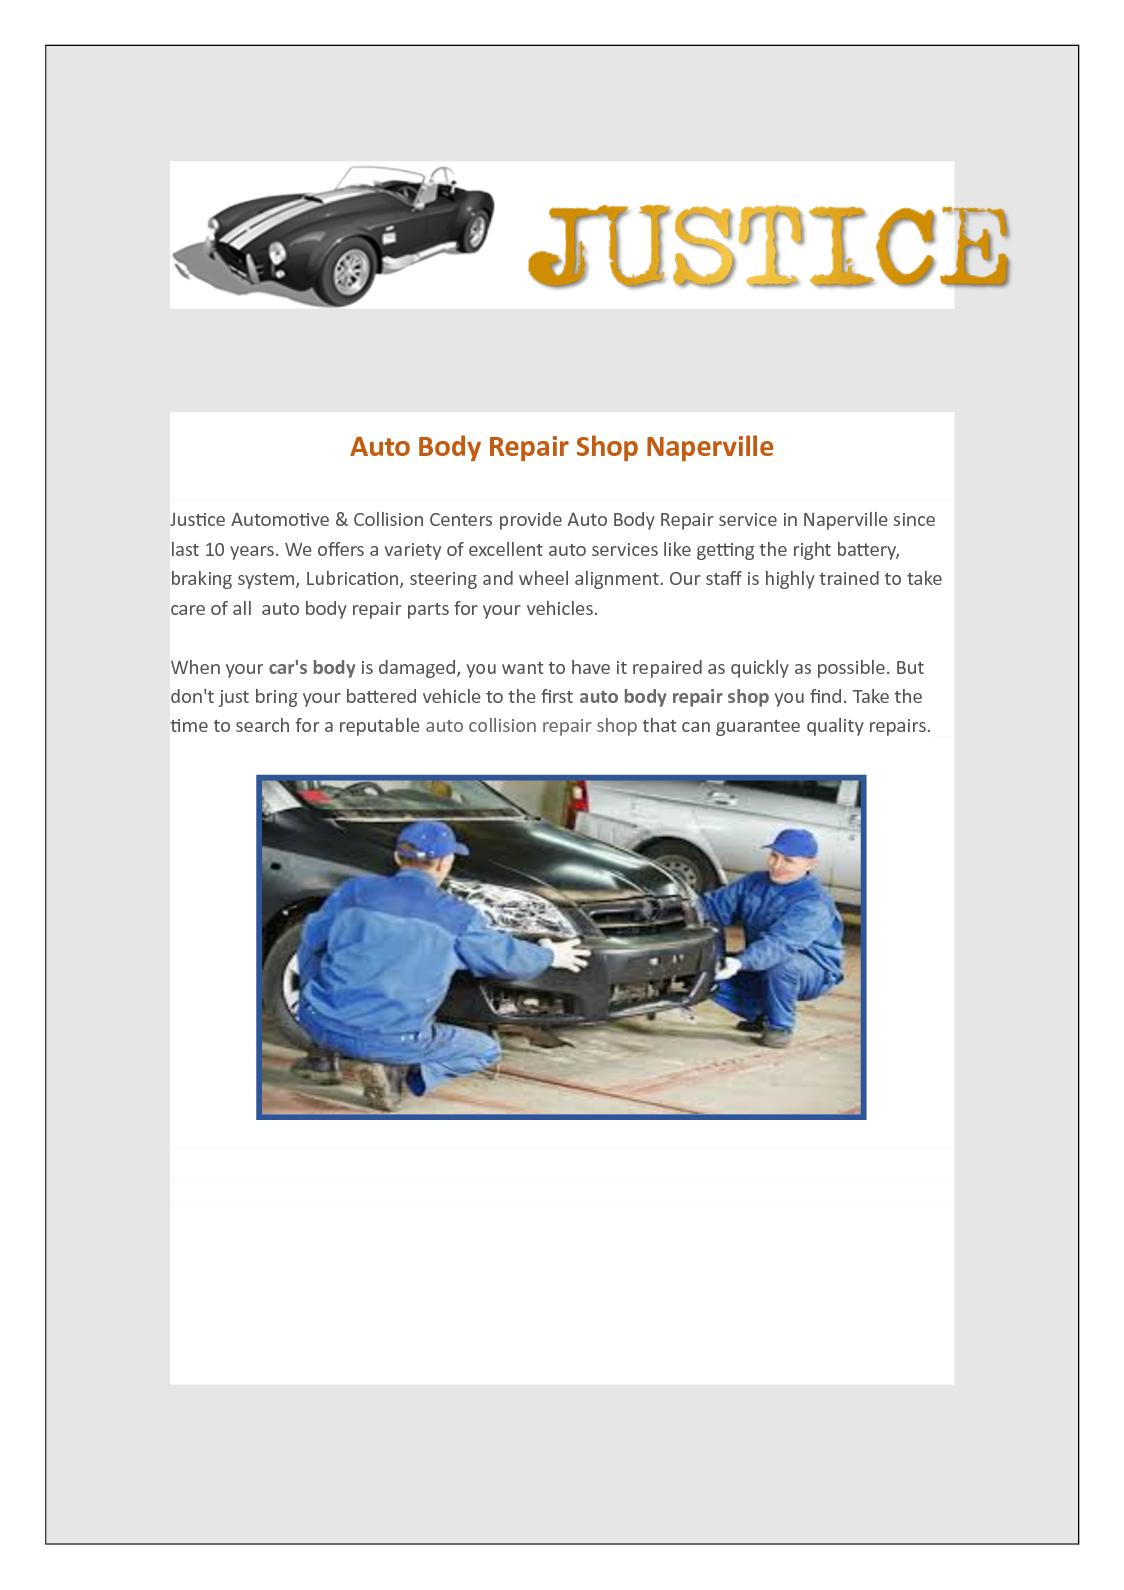 Auto Body Repair Shop >> Calameo Auto Body Repair Shop Naperville